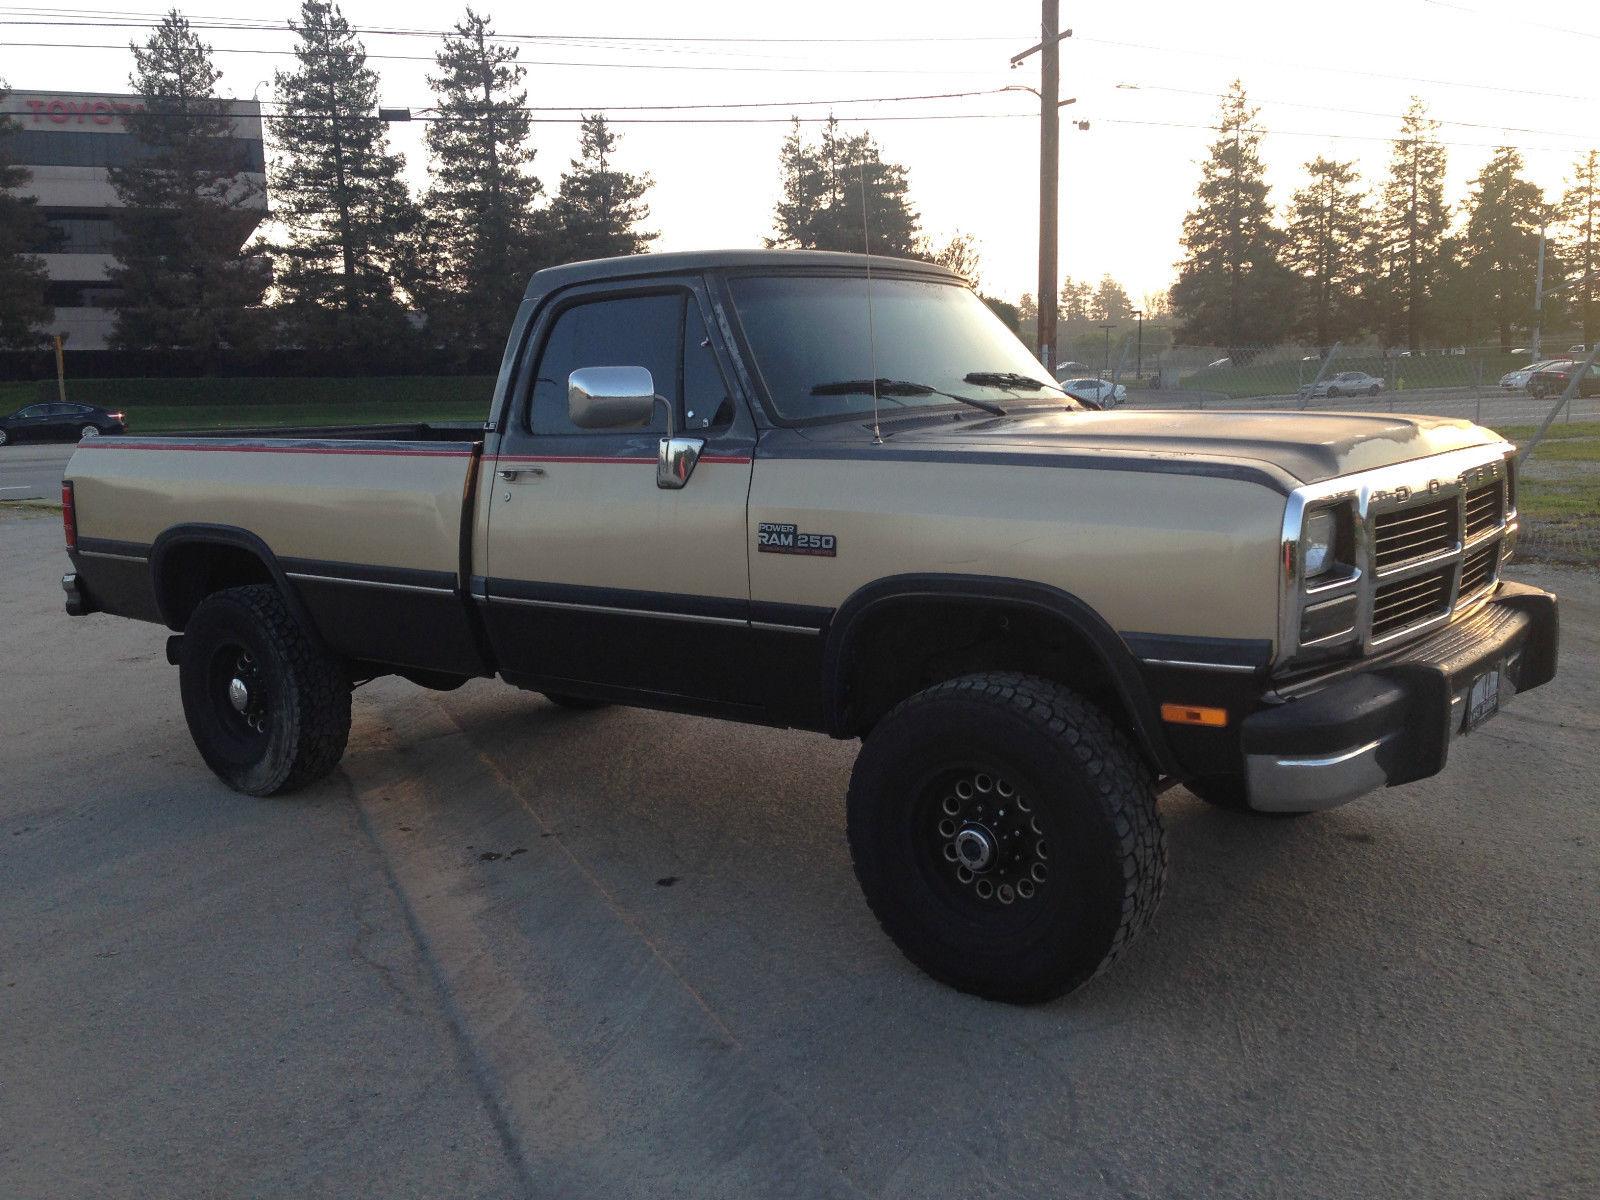 Dodge Ram W Cummins Turbo Diesel X Auto Thousands Invested on 1991 Dodge Truck